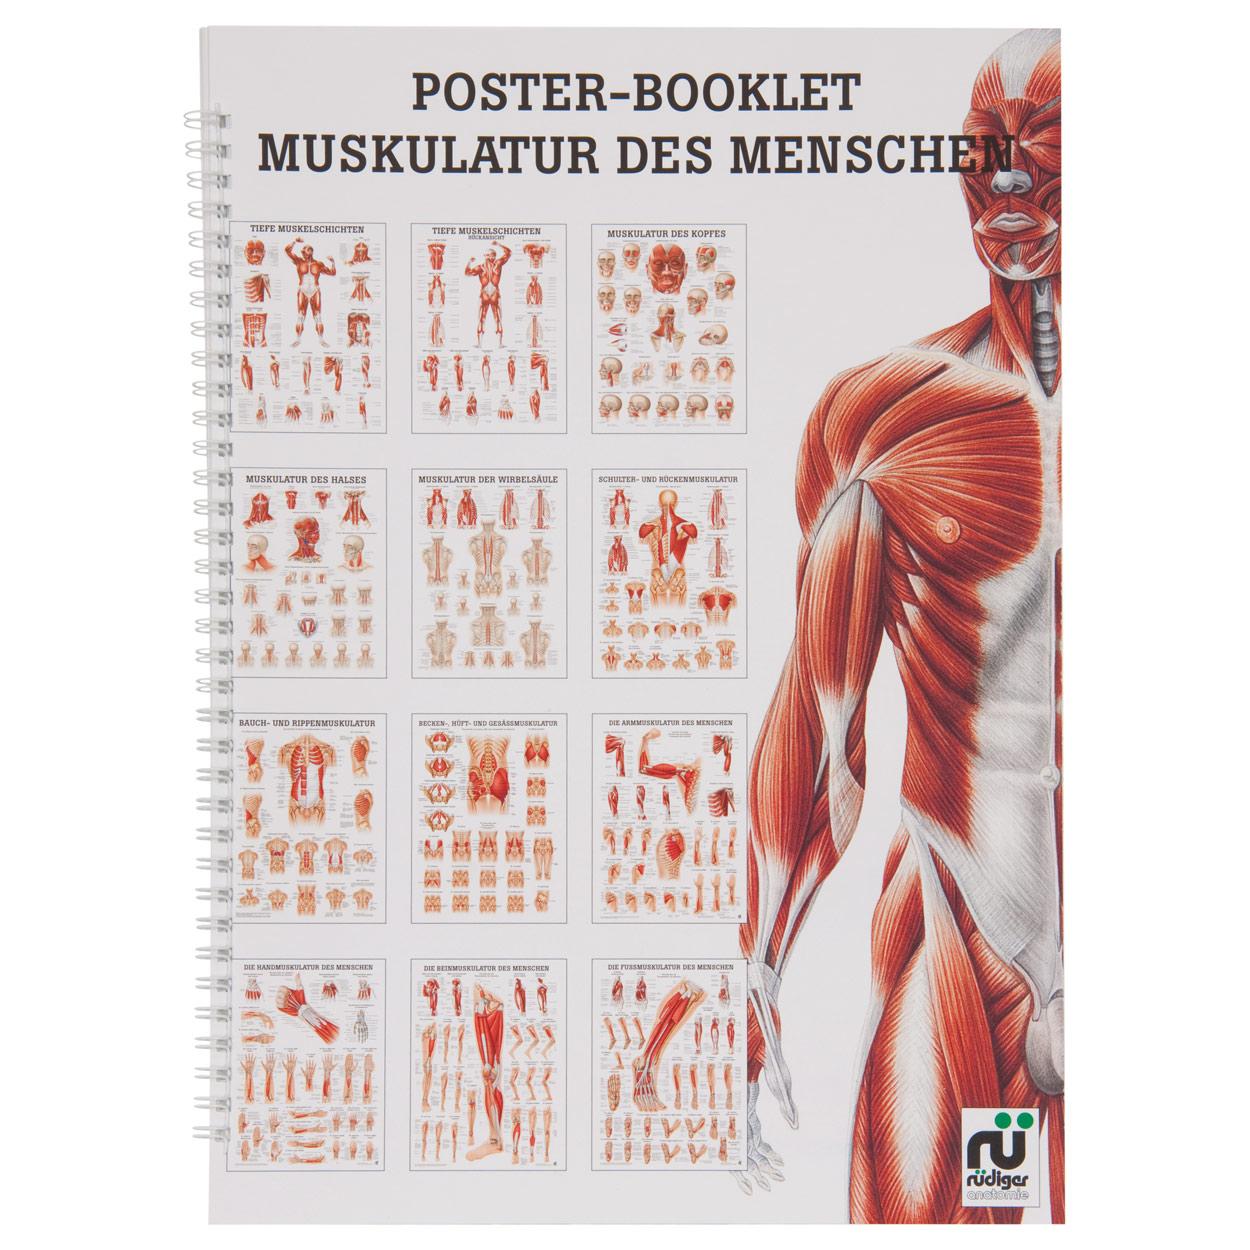 Muskulatur des Menschen Mini-Poster Booklet Anatomie 34x24 cm, 12 ...